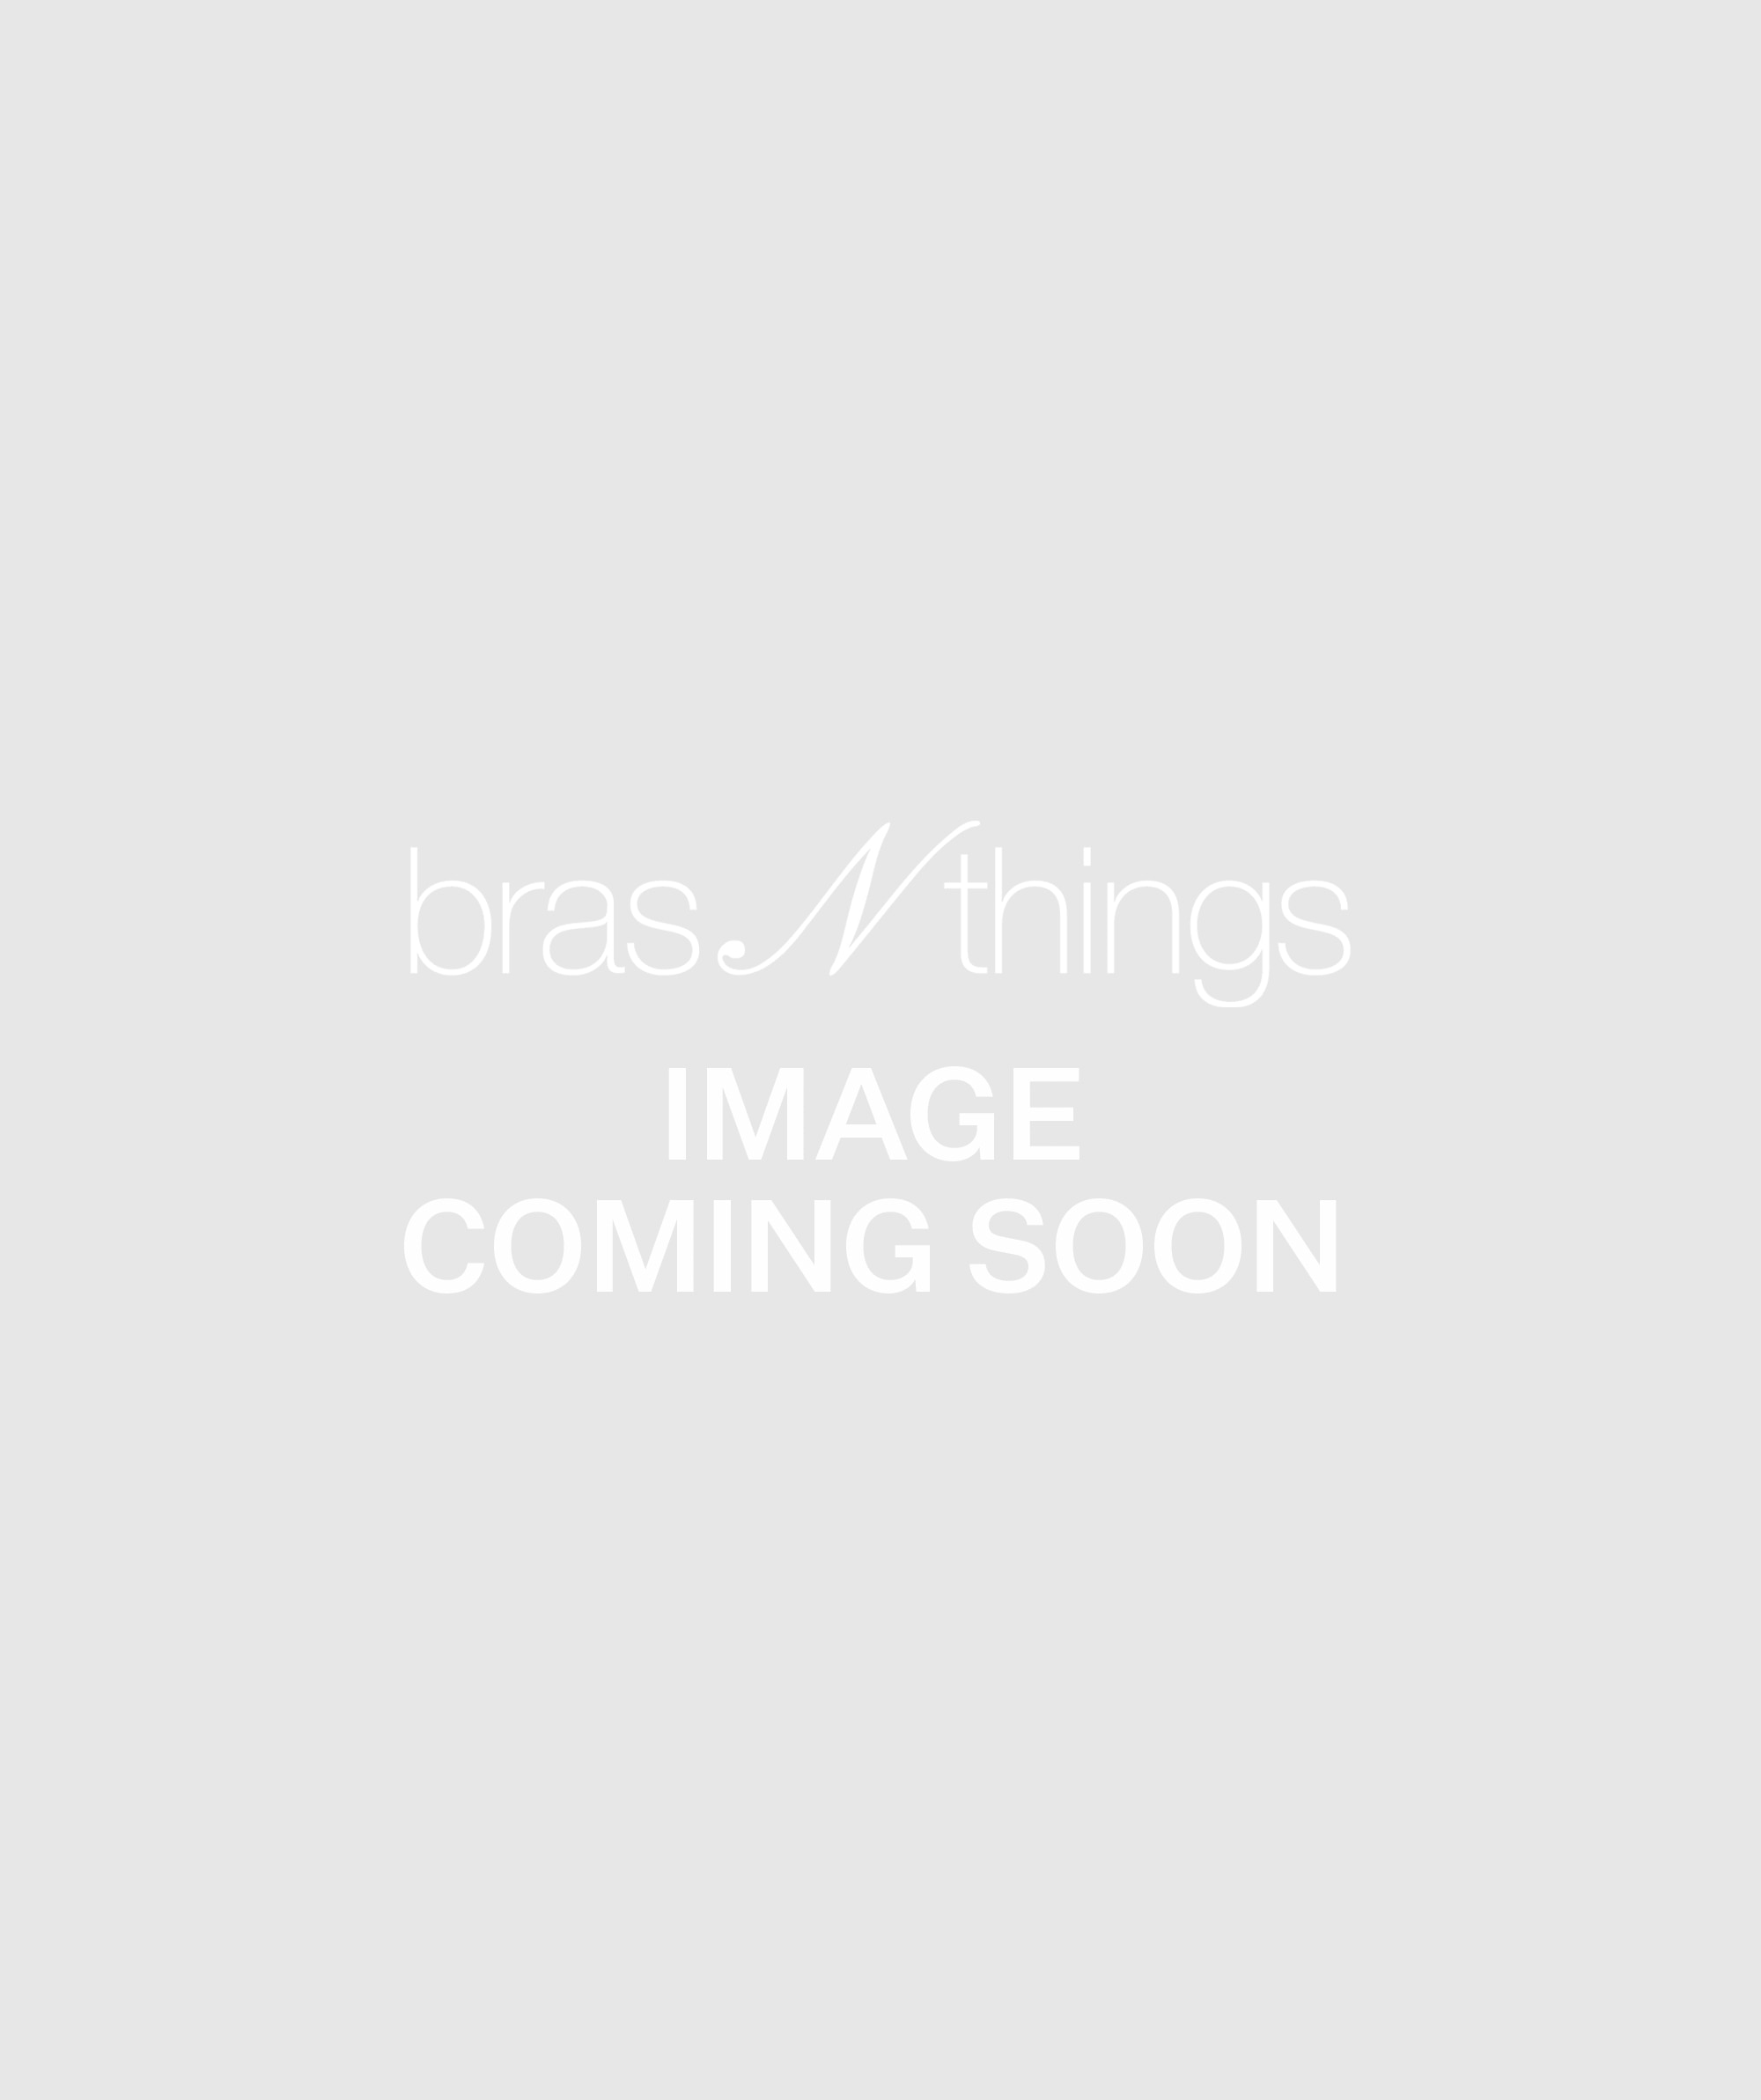 Fiona Balconette Contour Bra - Print Check/ Black